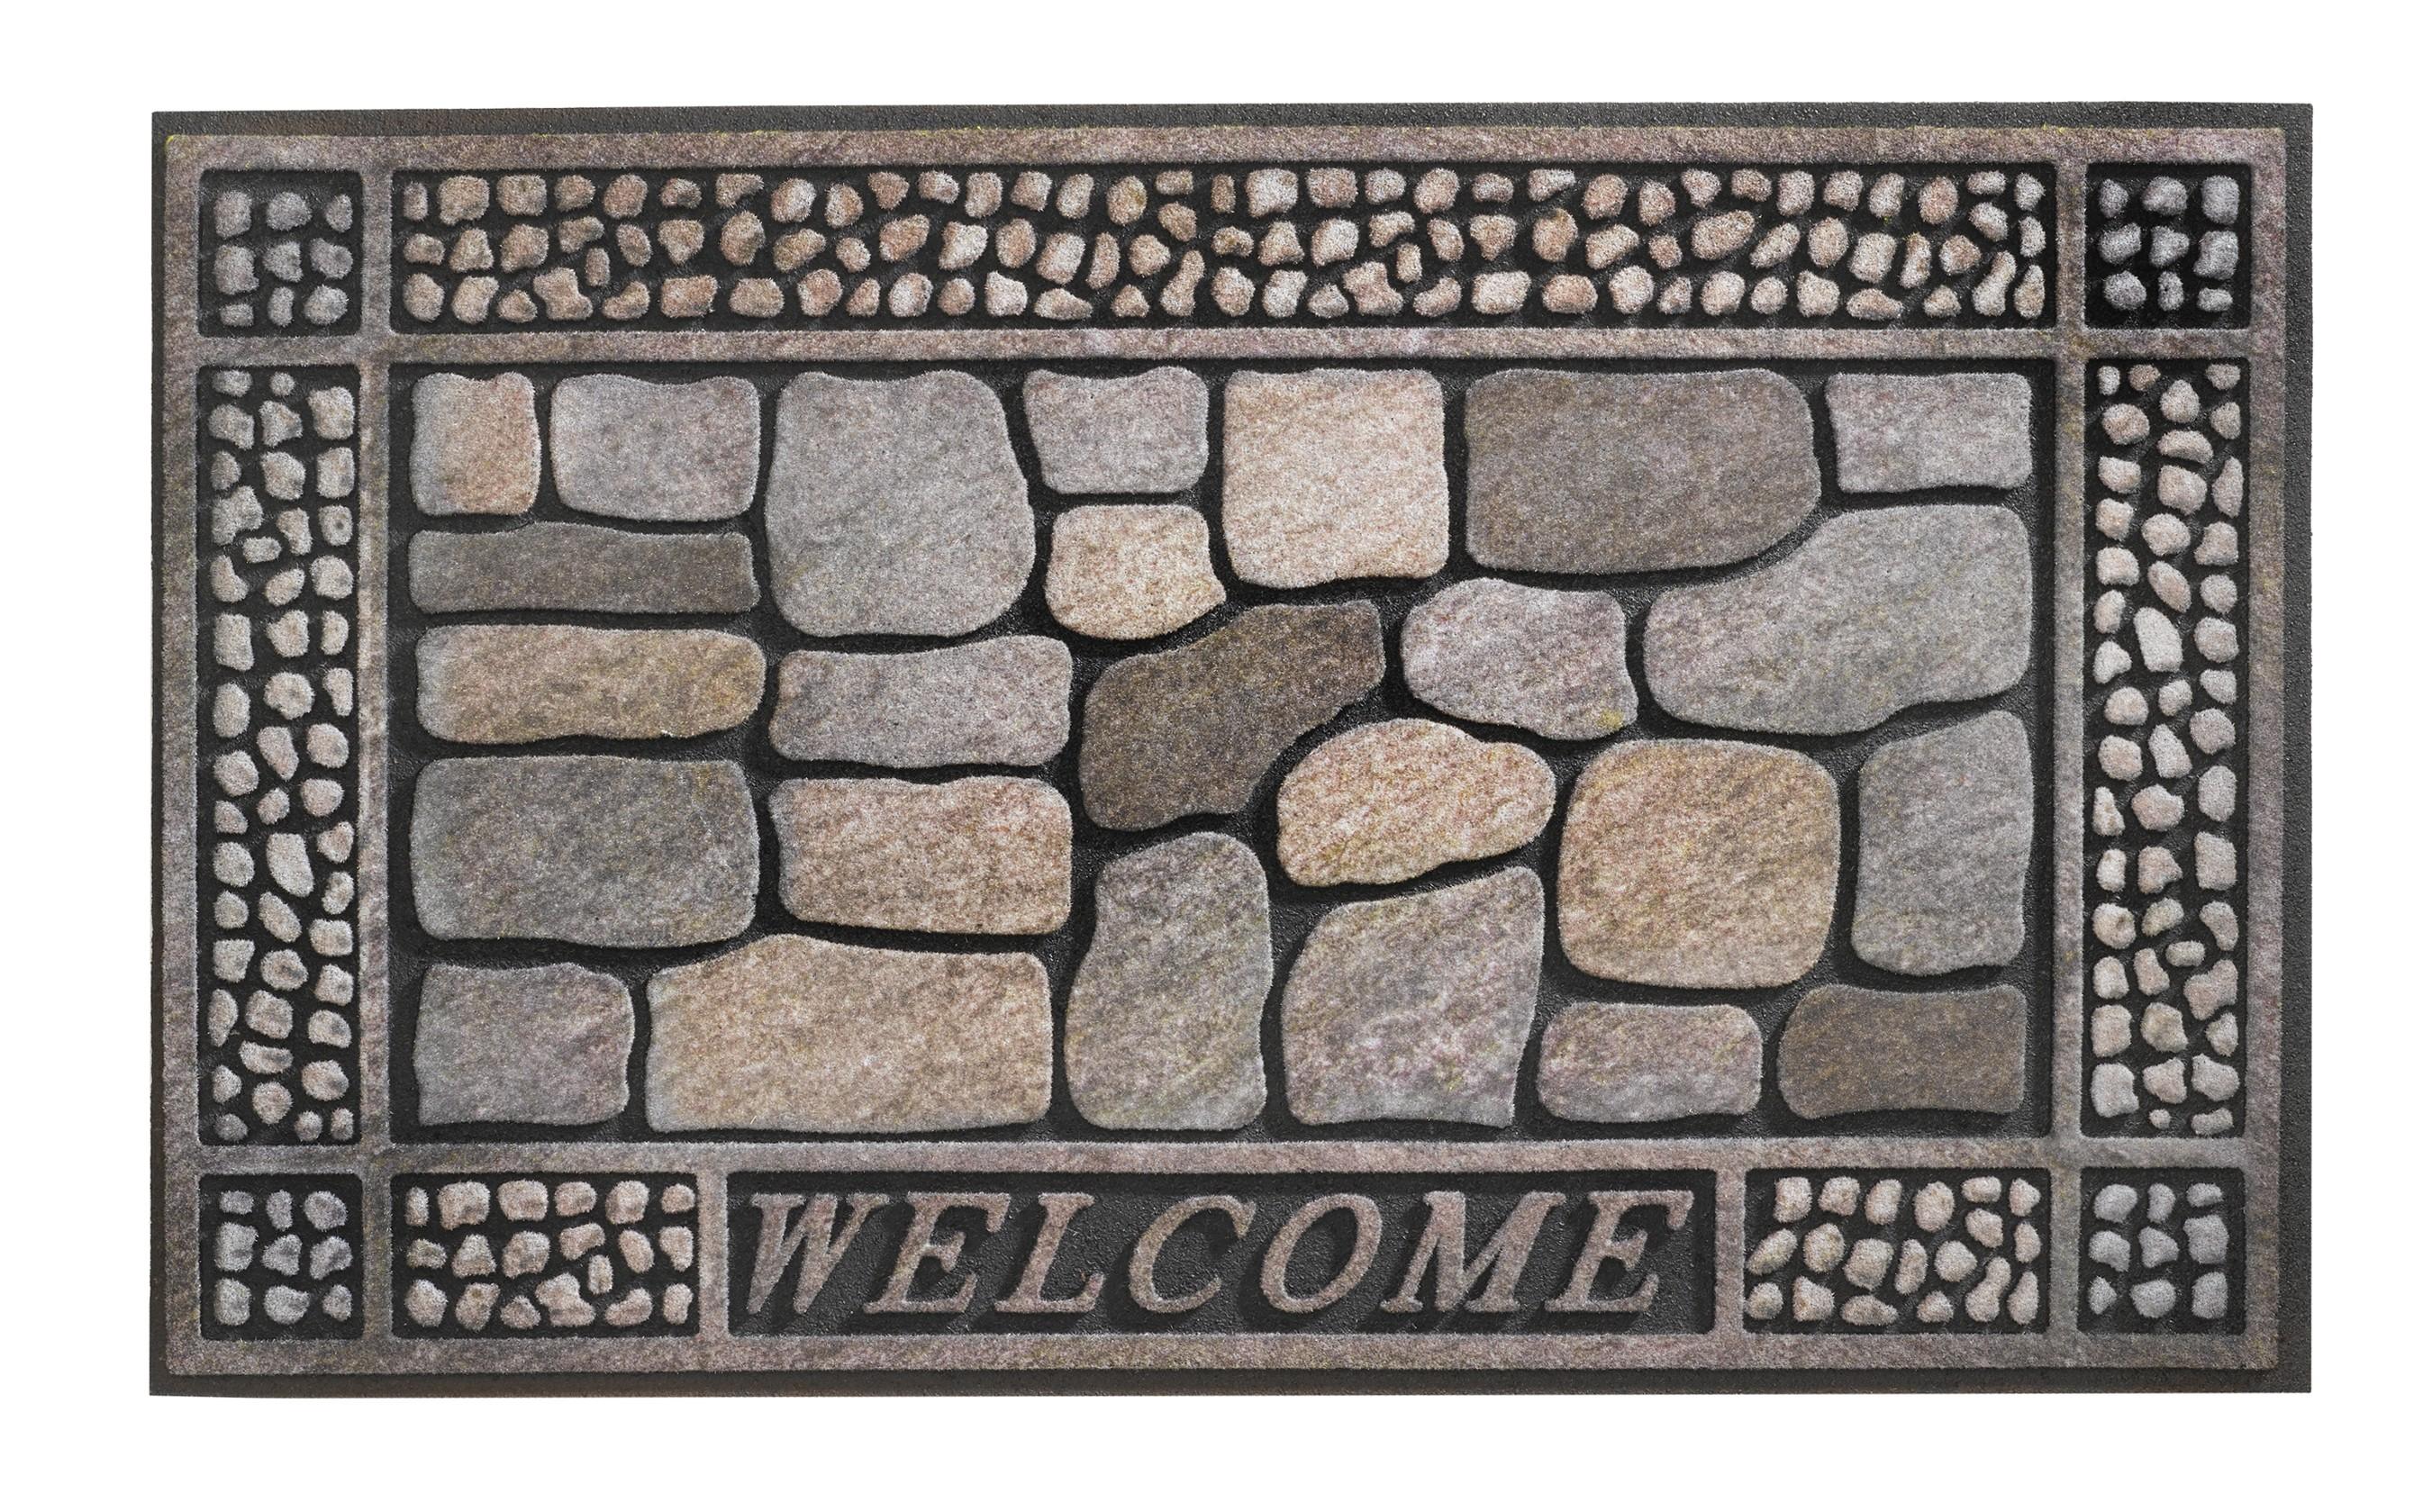 Hamat Fußmatte / Eco-Fußmatte Eco Master 45x75cm Welcome Stones Bild 1